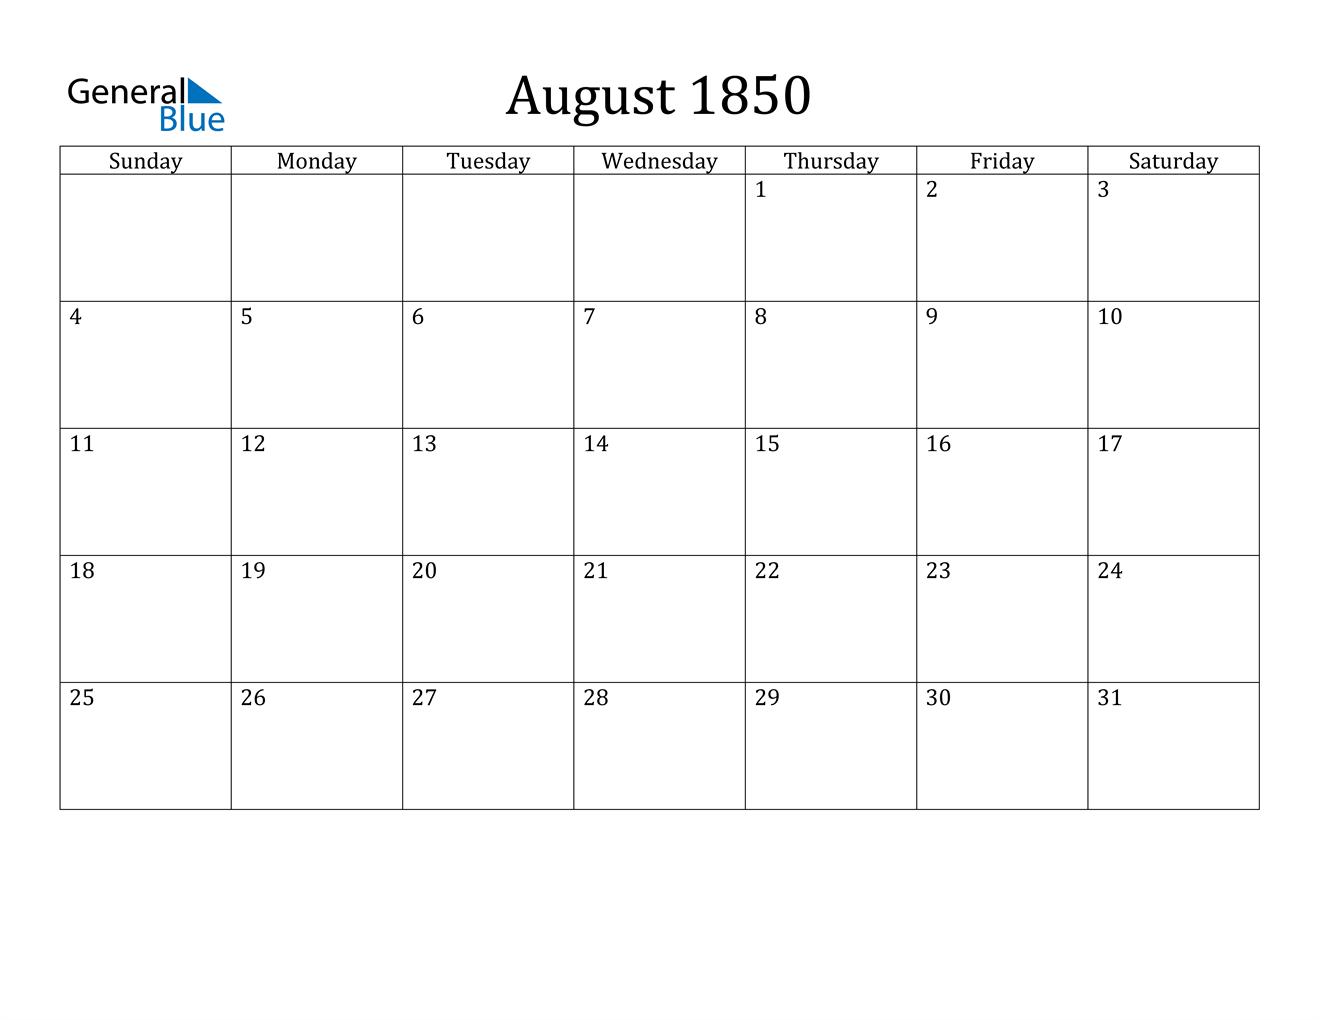 Image of August 1850 Calendar